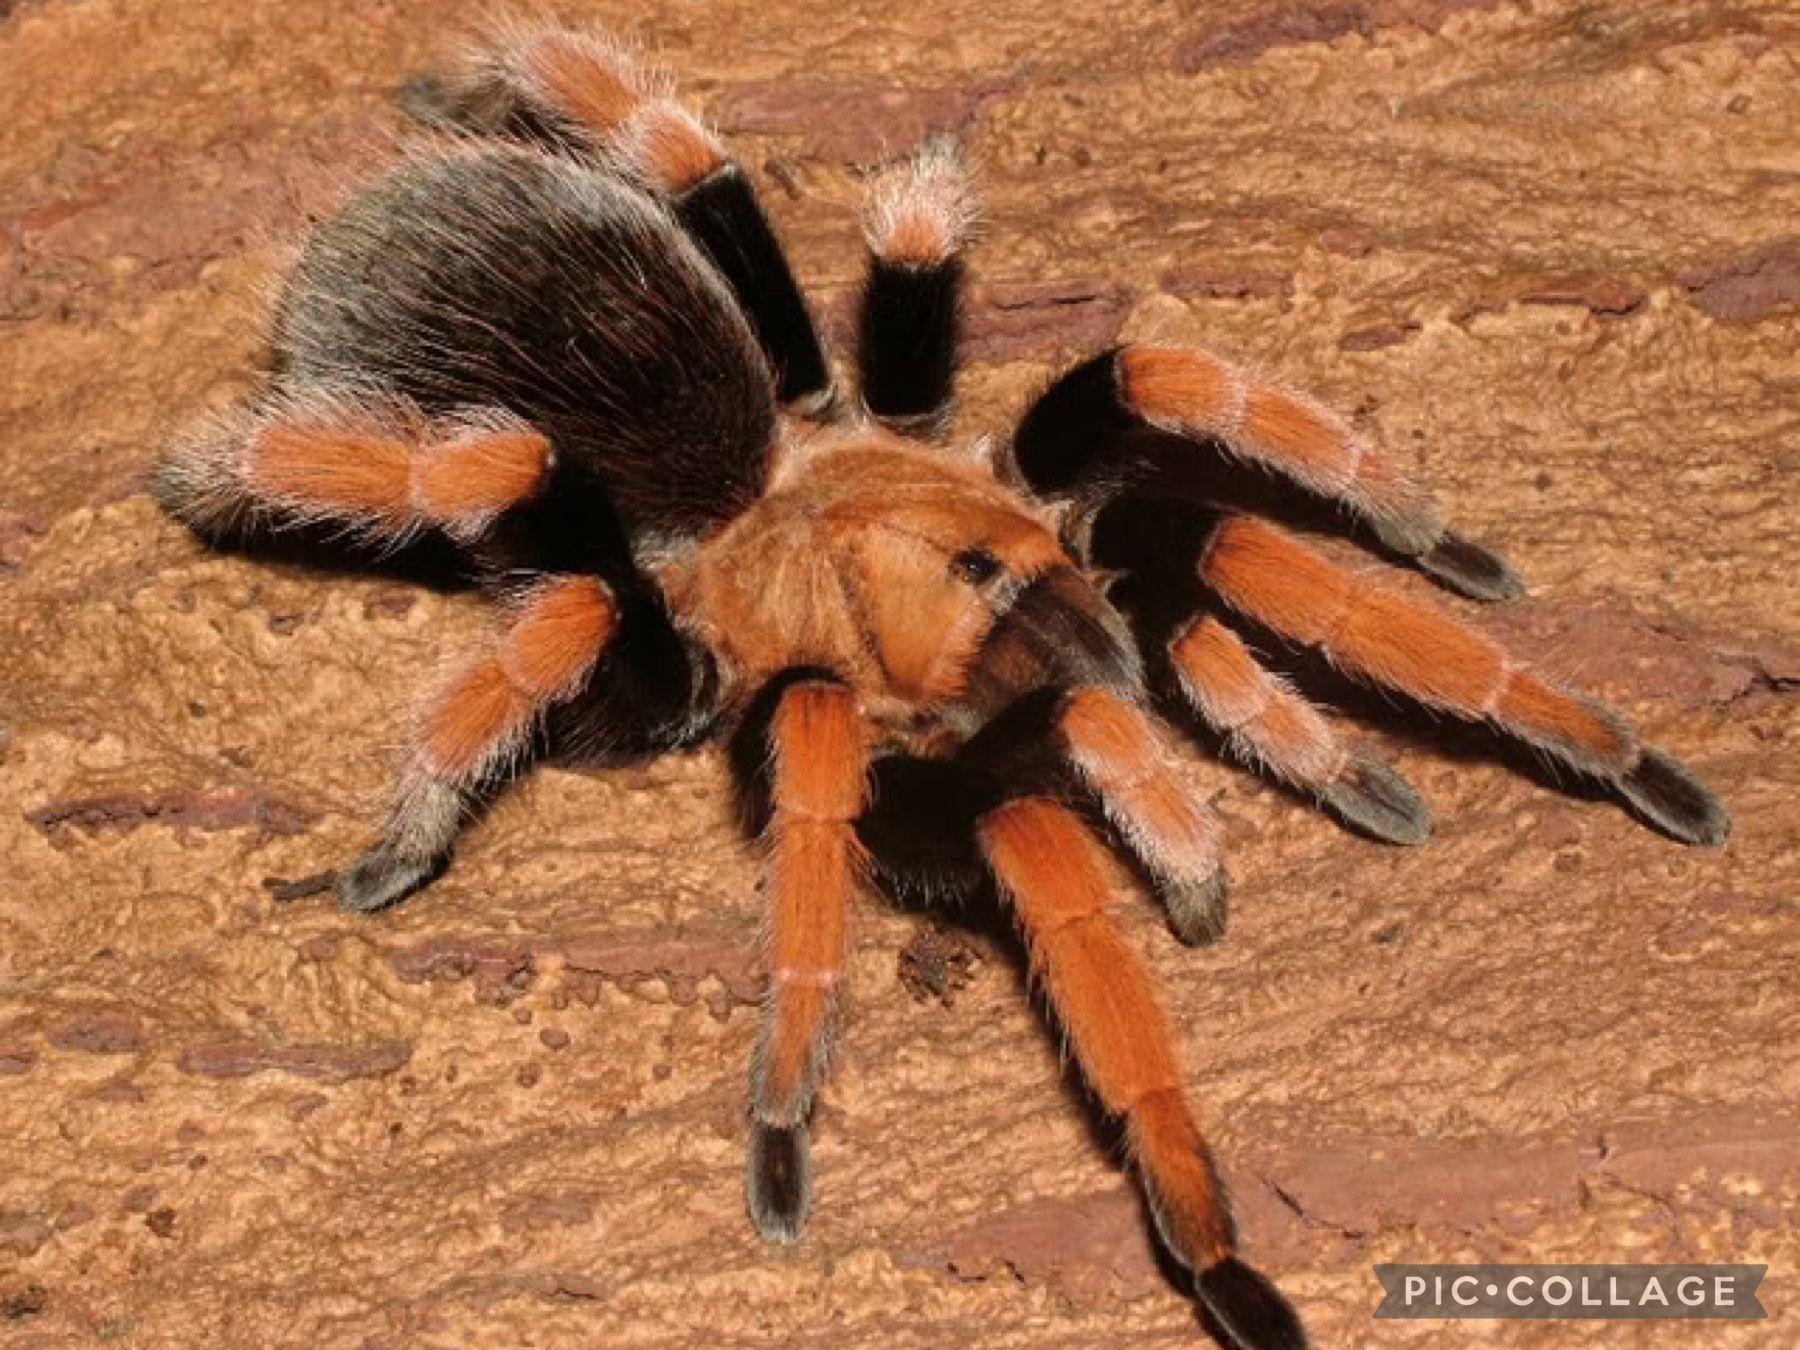 Tarantula Tarantula Species Of A Arachnids Spiders Scorpions Ticks Mites And Wrasses Diet Insects Predators Frog In 2021